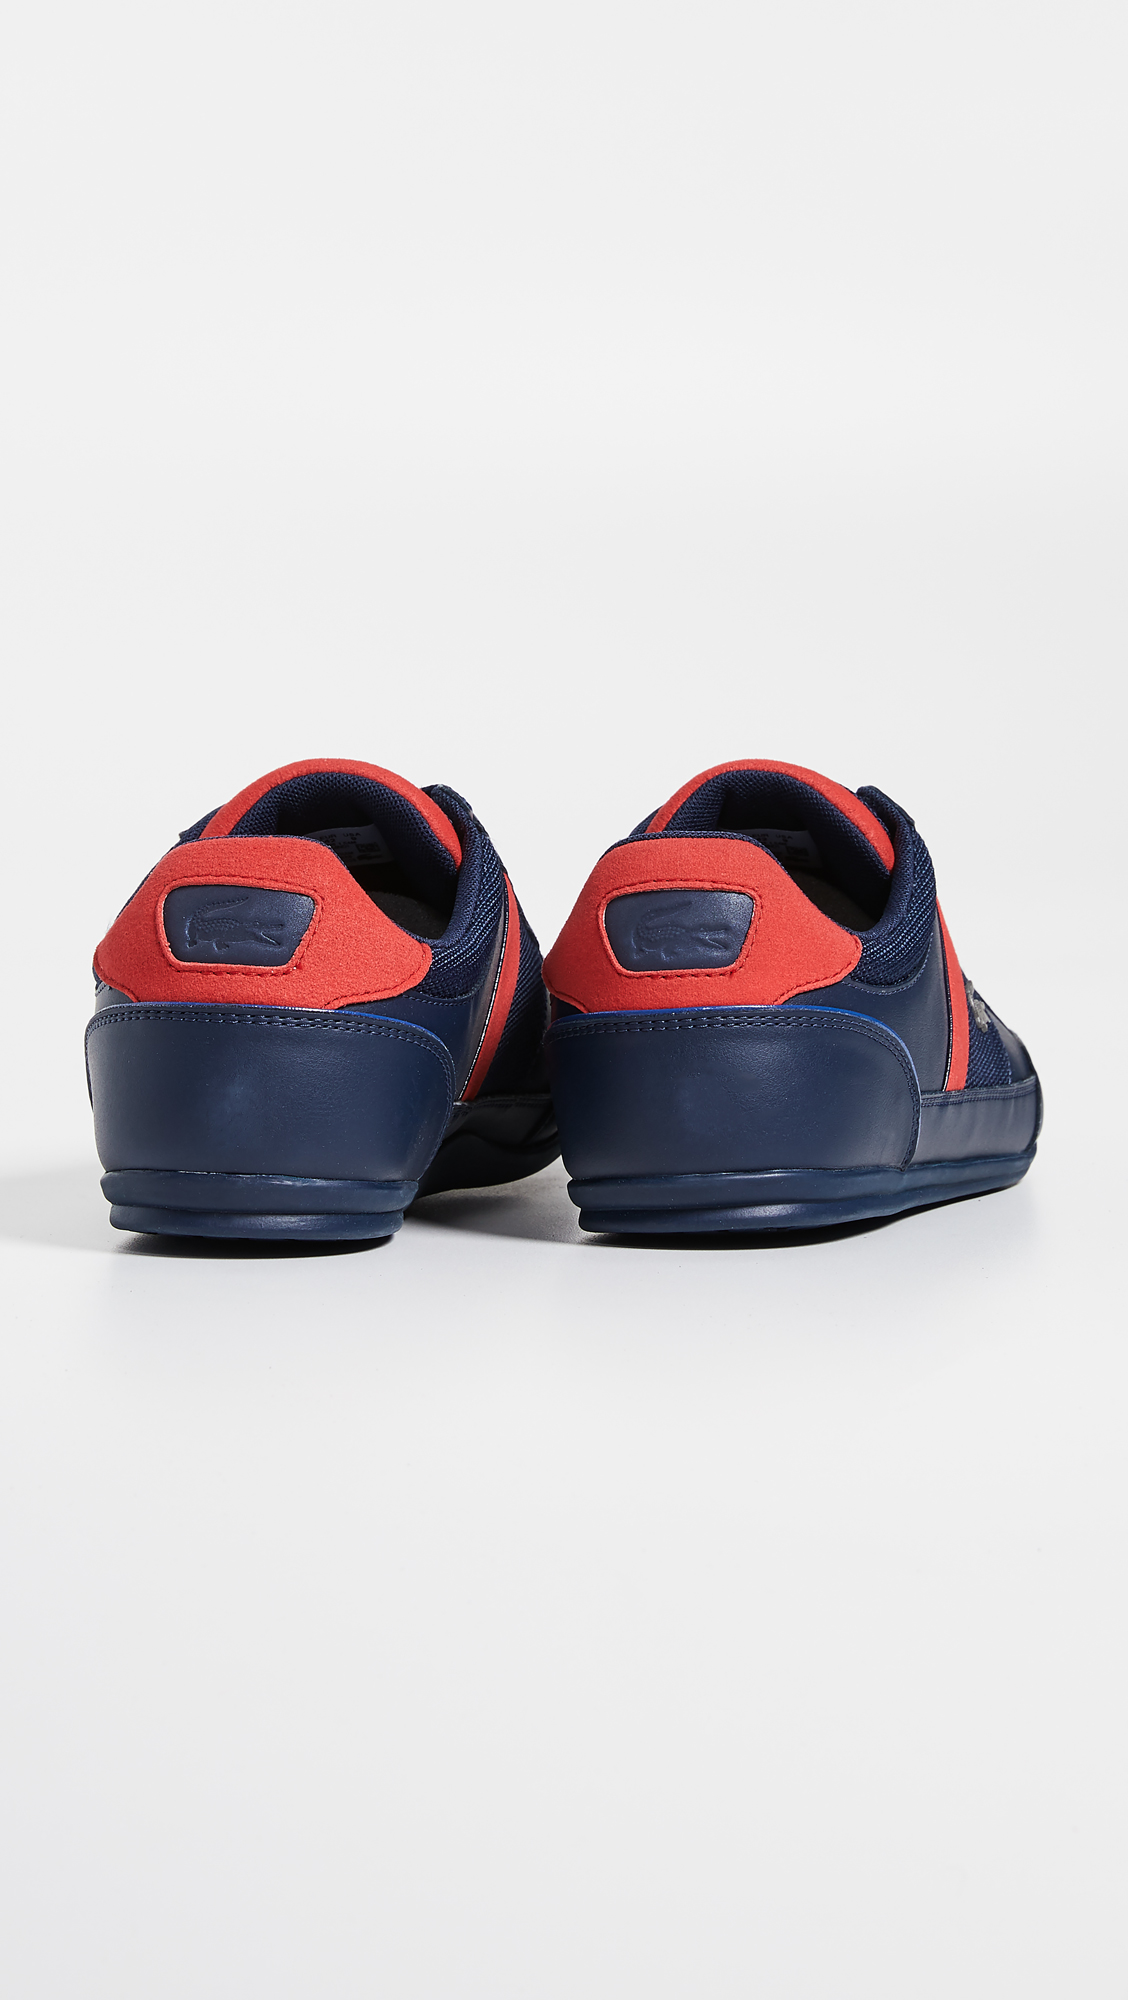 Lacoste Chaymon 318 1 Sneakers East Dane D Island Shoes Moccasine Slip On Suede Blue